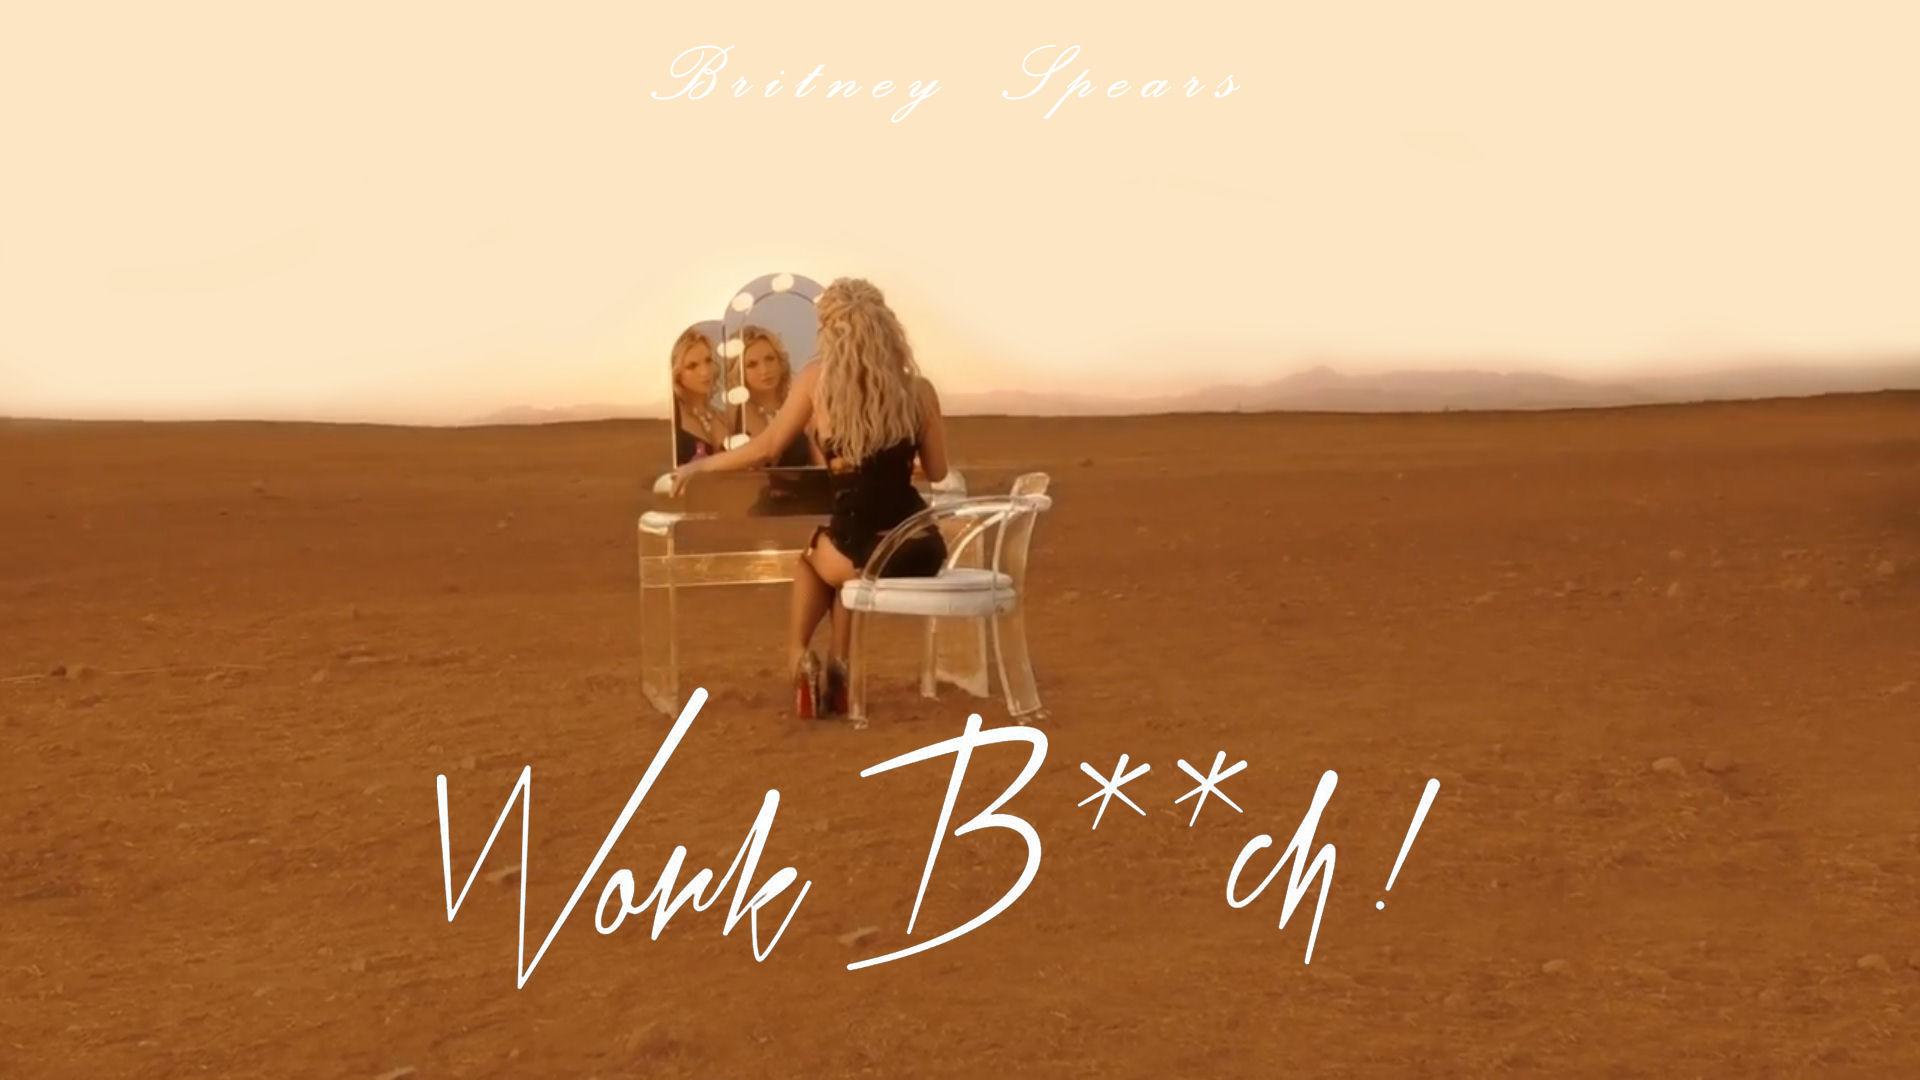 Britney spears work bitch 7